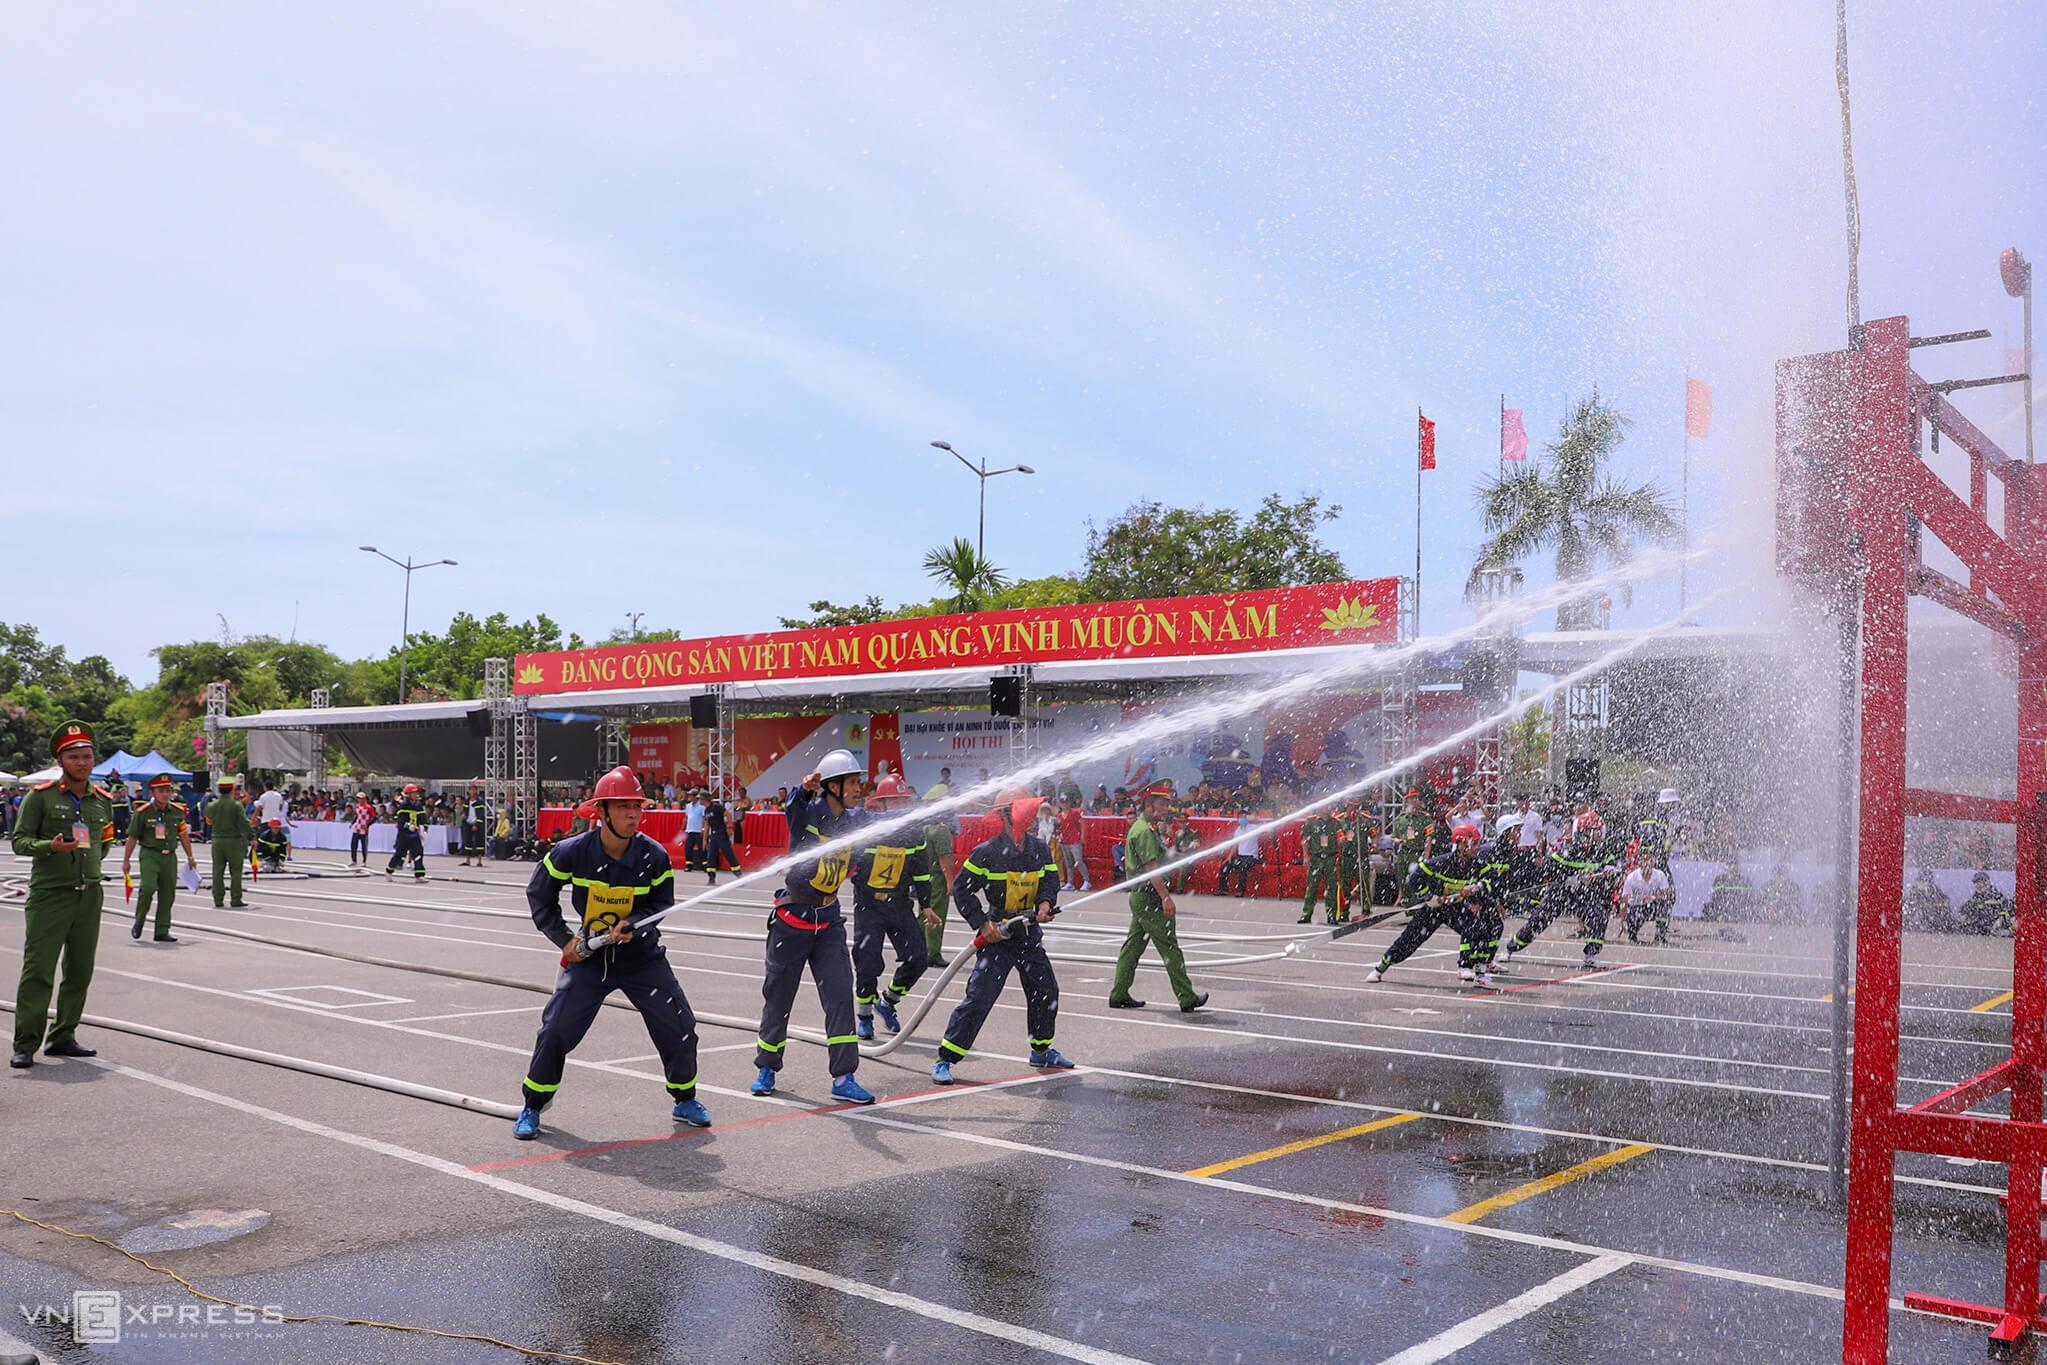 Firefighters battle flames in Da Nang contest